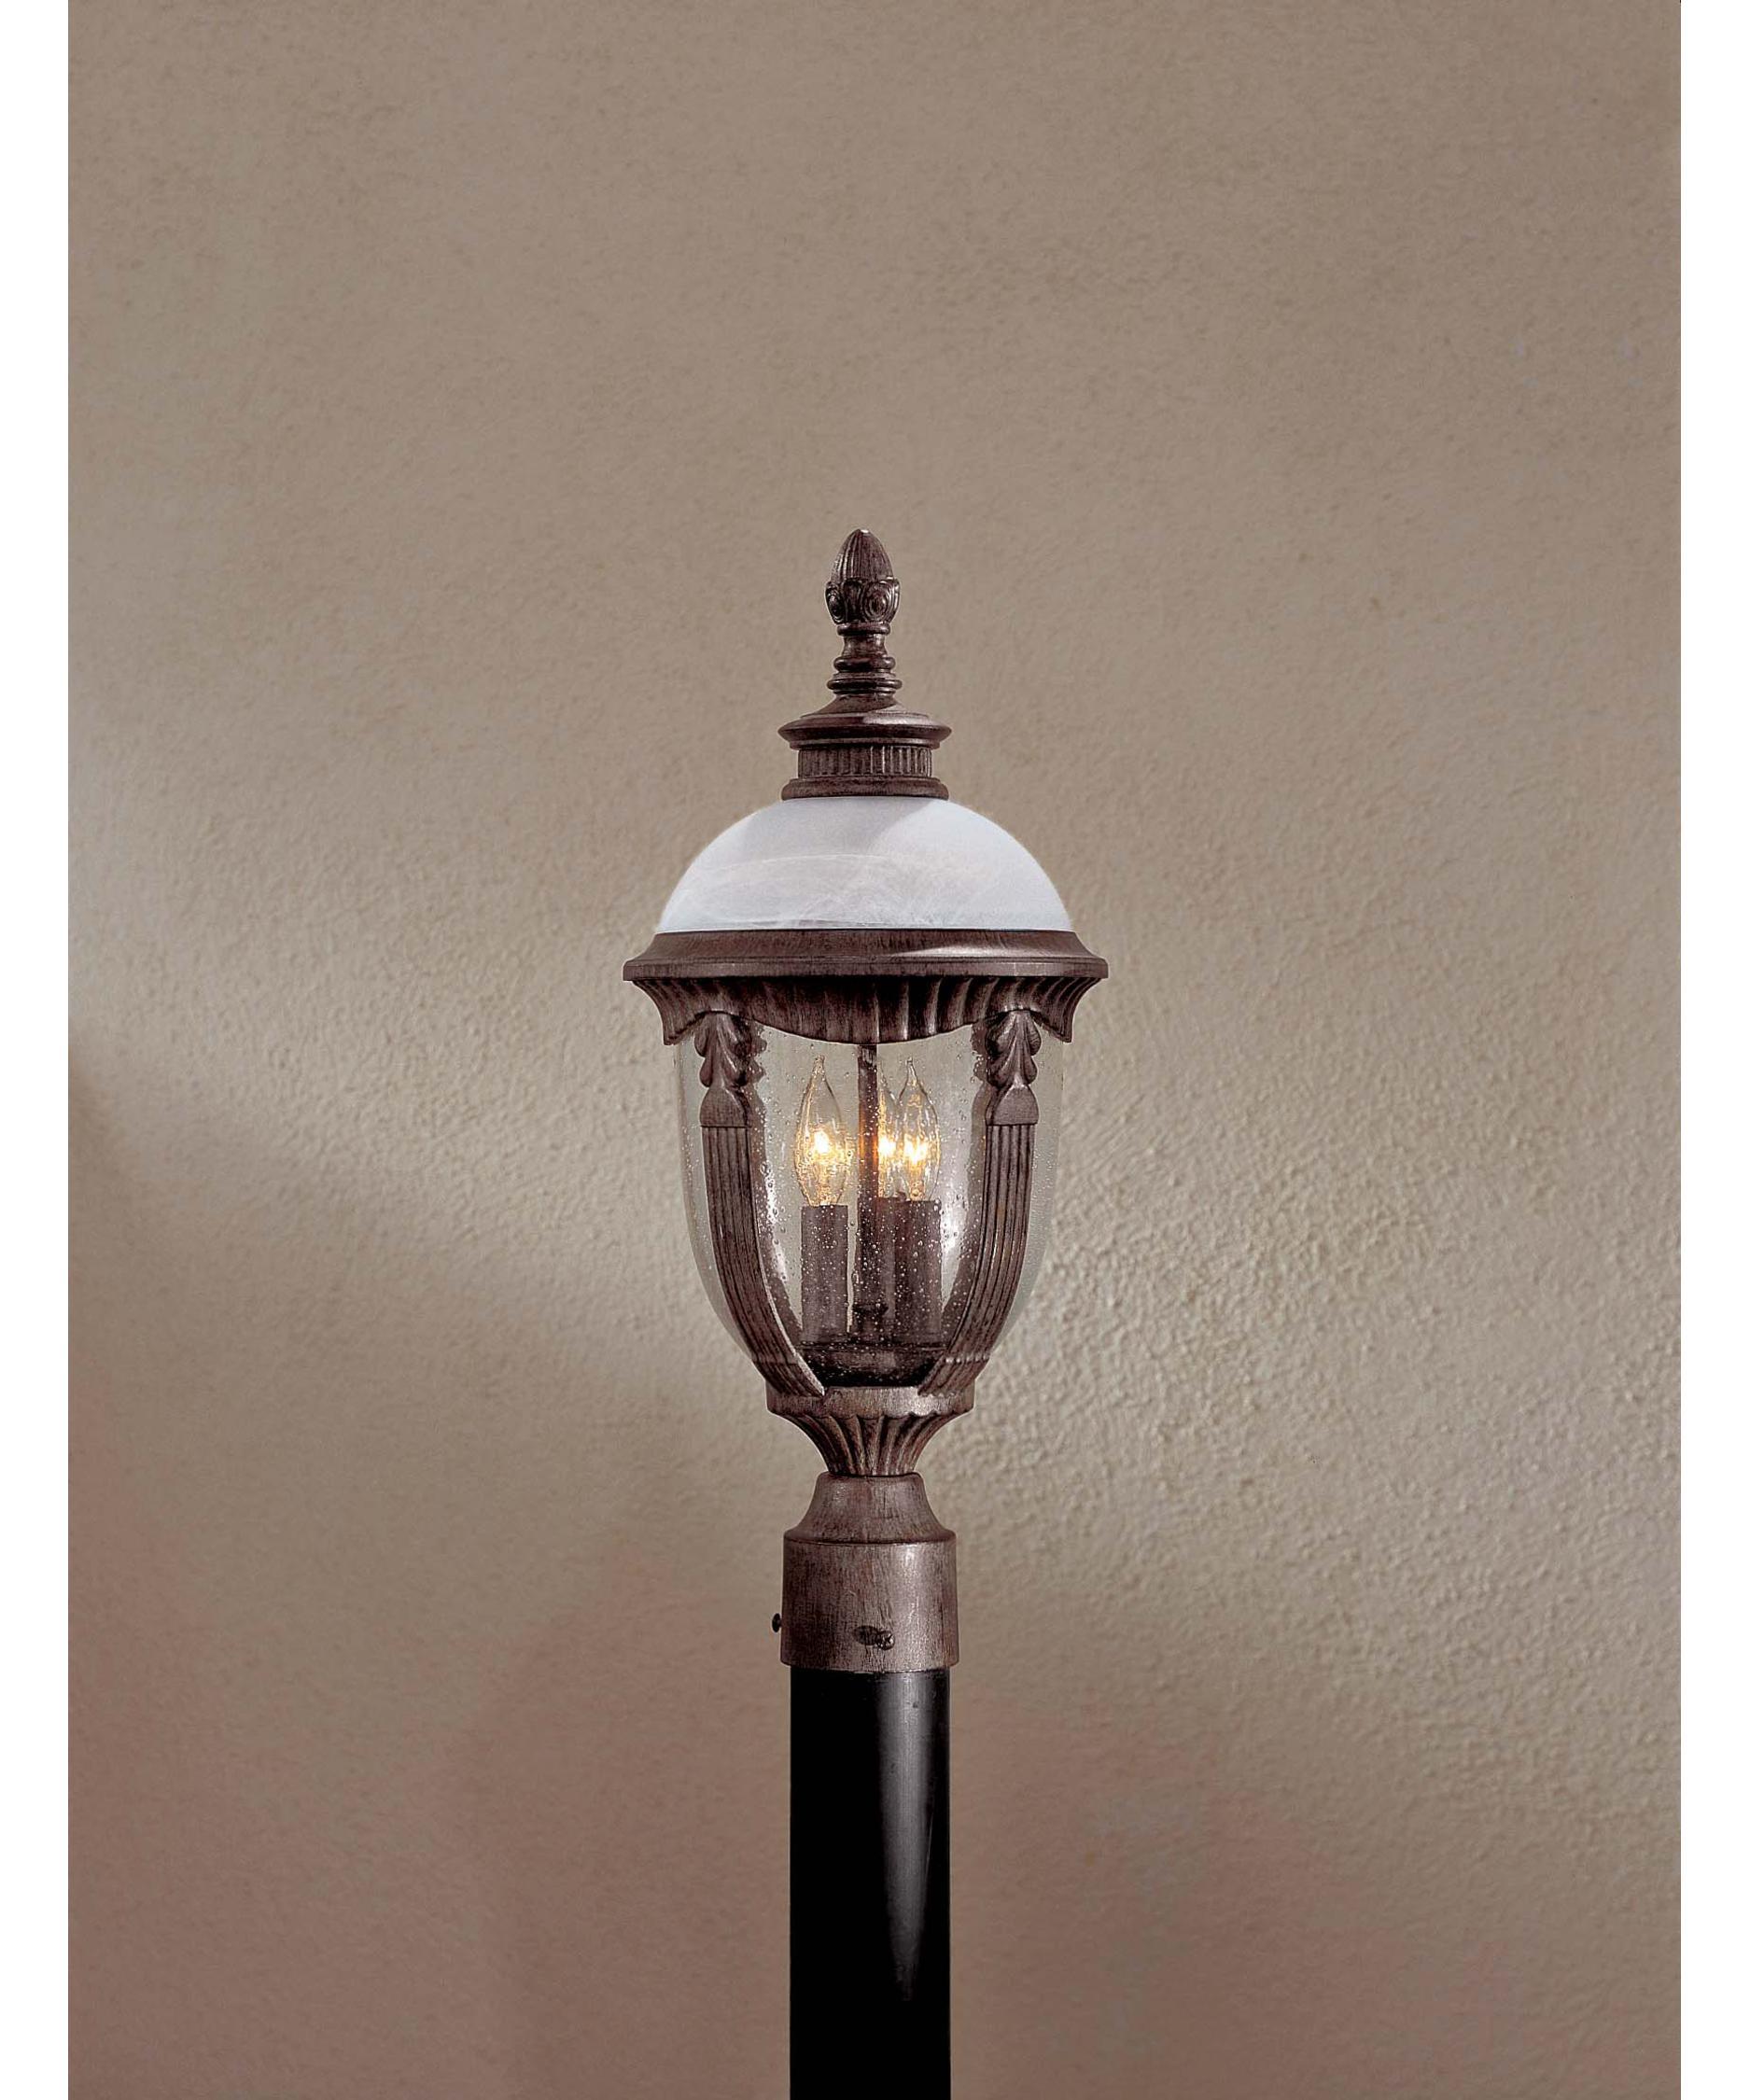 Minka Lavery 8976 Heron Bay 9 Inch Wide 3 Light Outdoor Post Lamp | Capitol  Lighting 1 800lighting.com